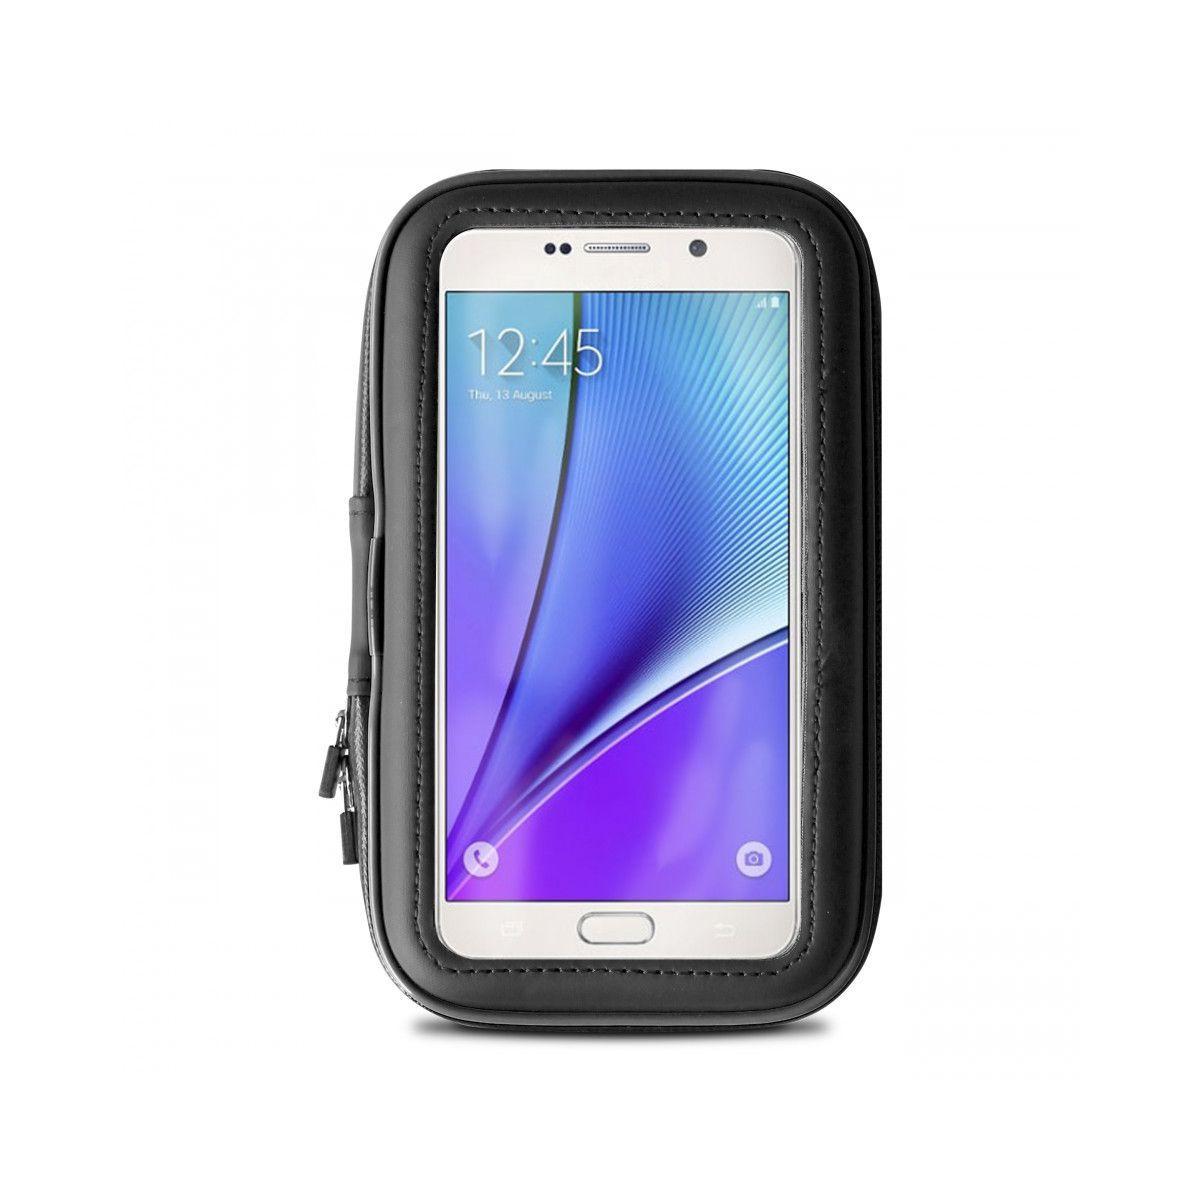 Support puro vélo universel smartphone j - 20% de remise immédiate avec le code : multi20